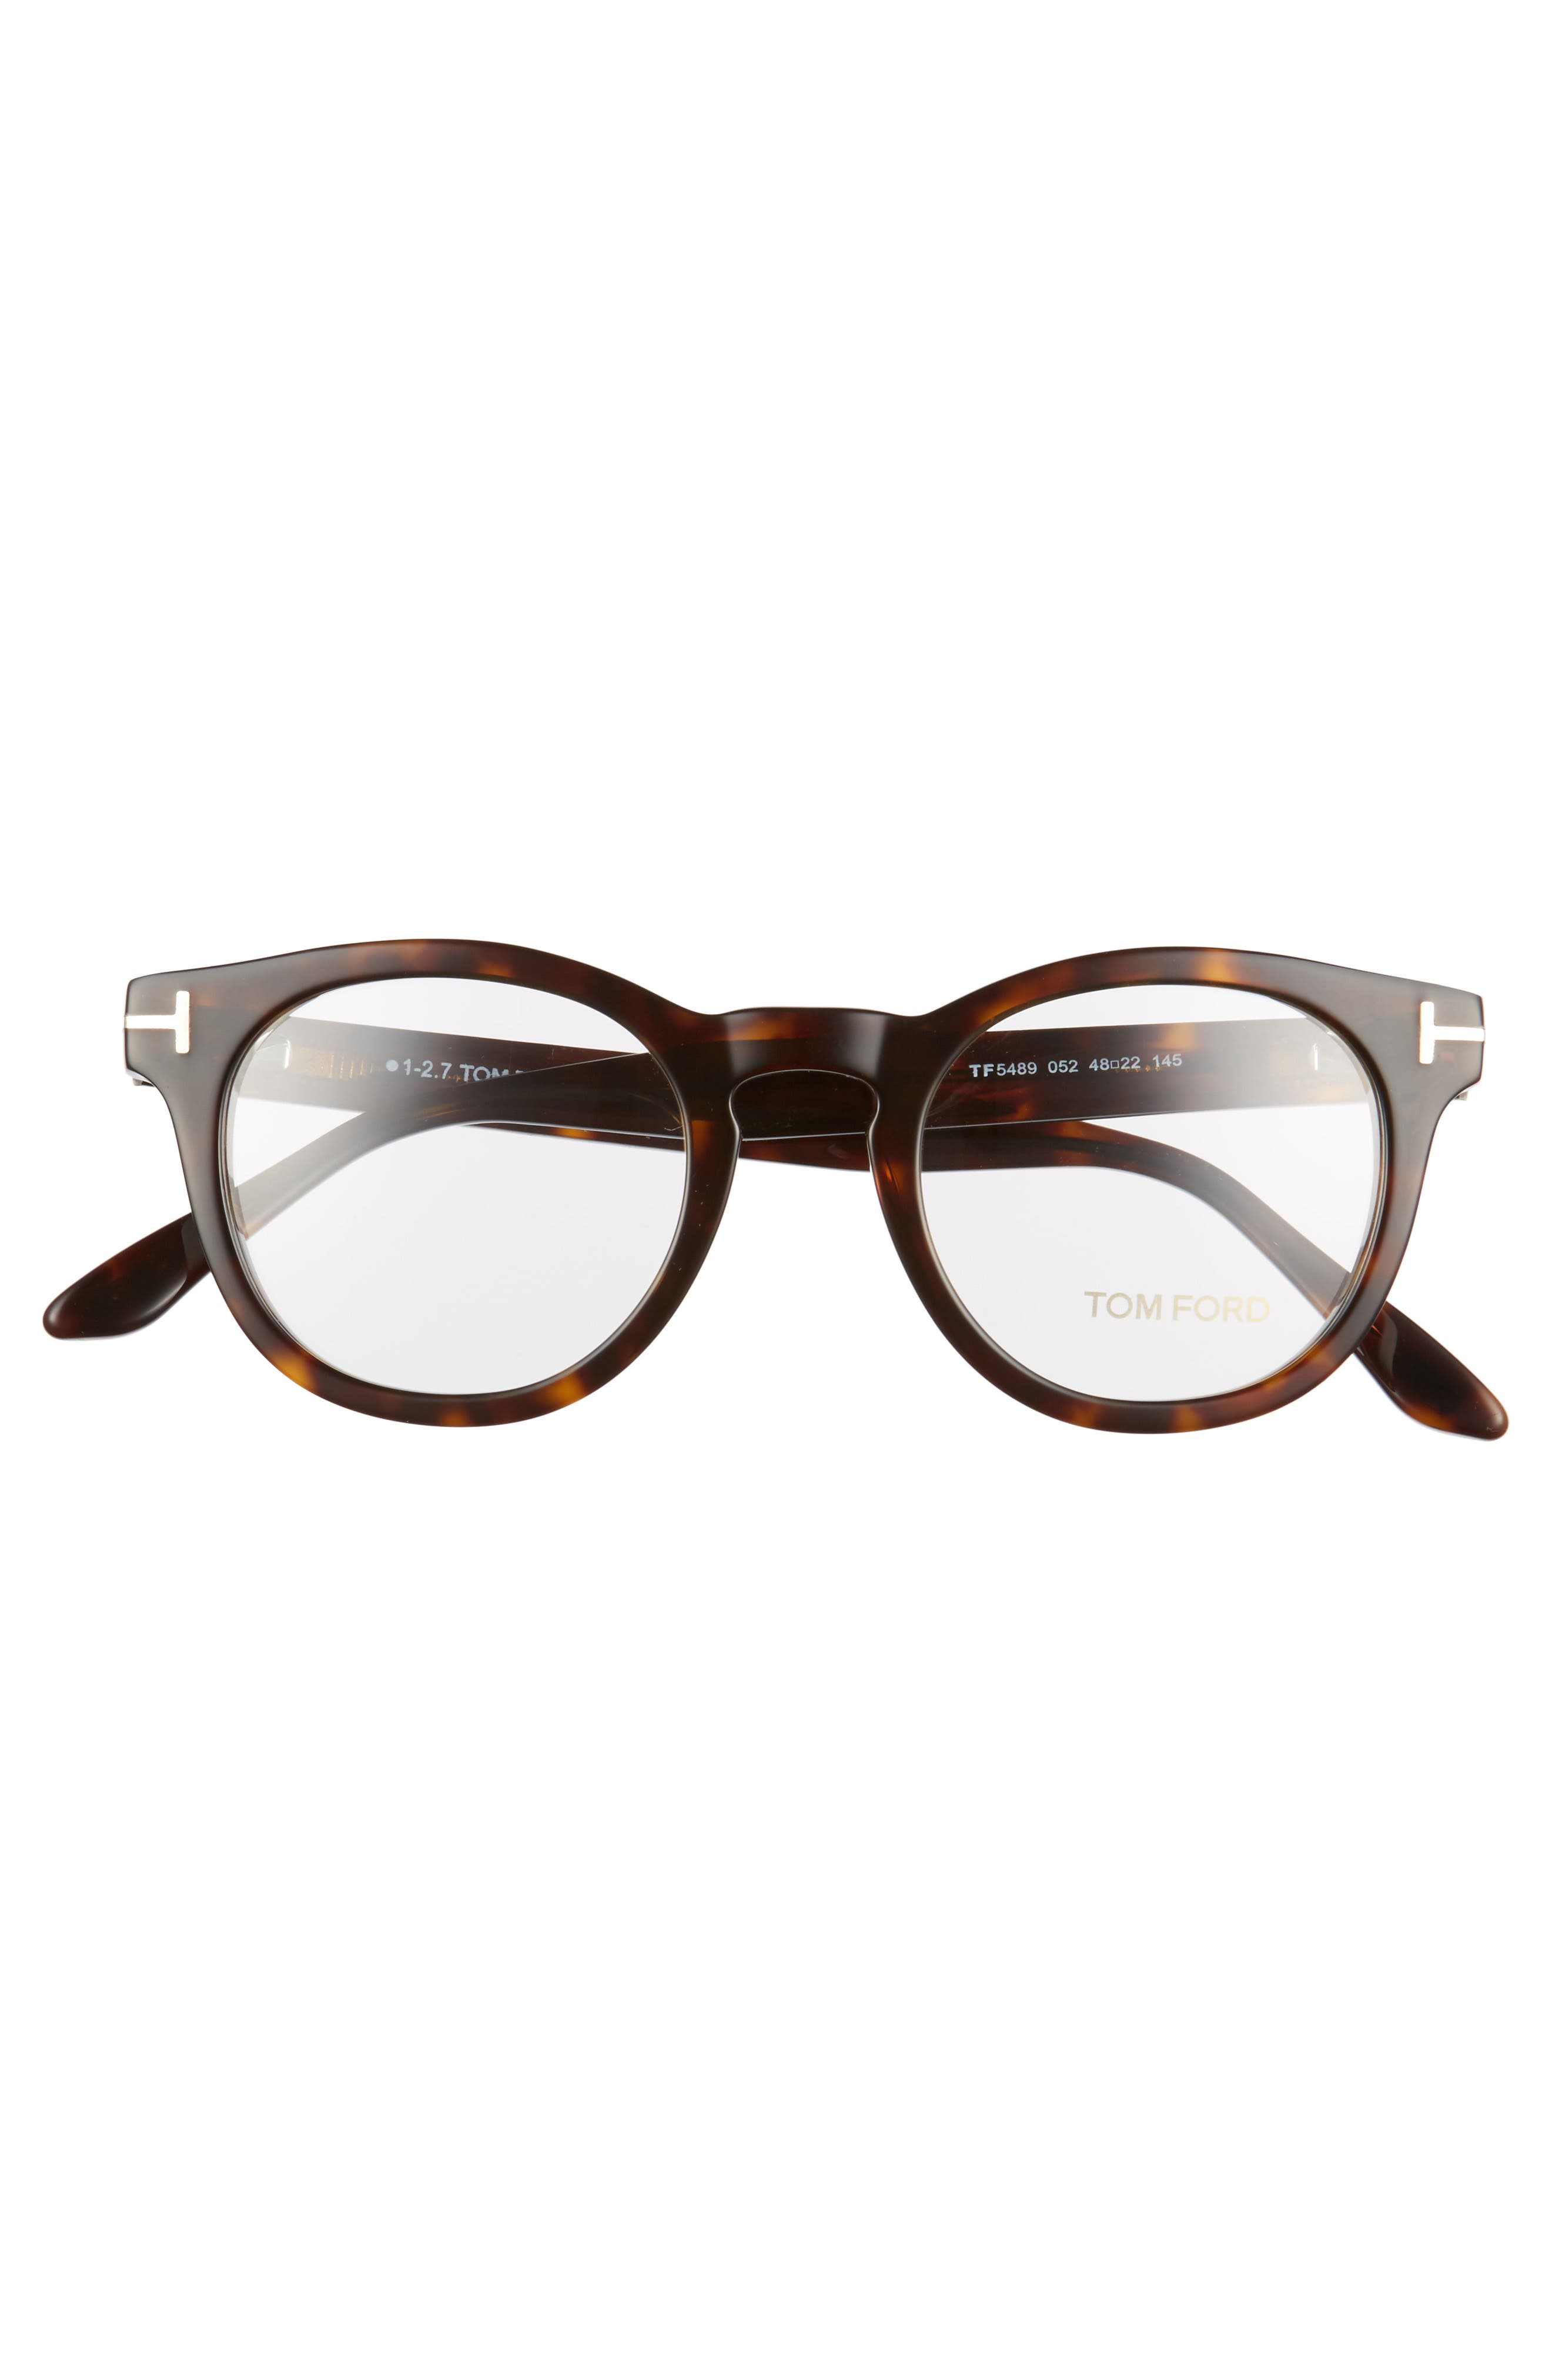 48mm Round Optical Glasses,                             Alternate thumbnail 8, color,